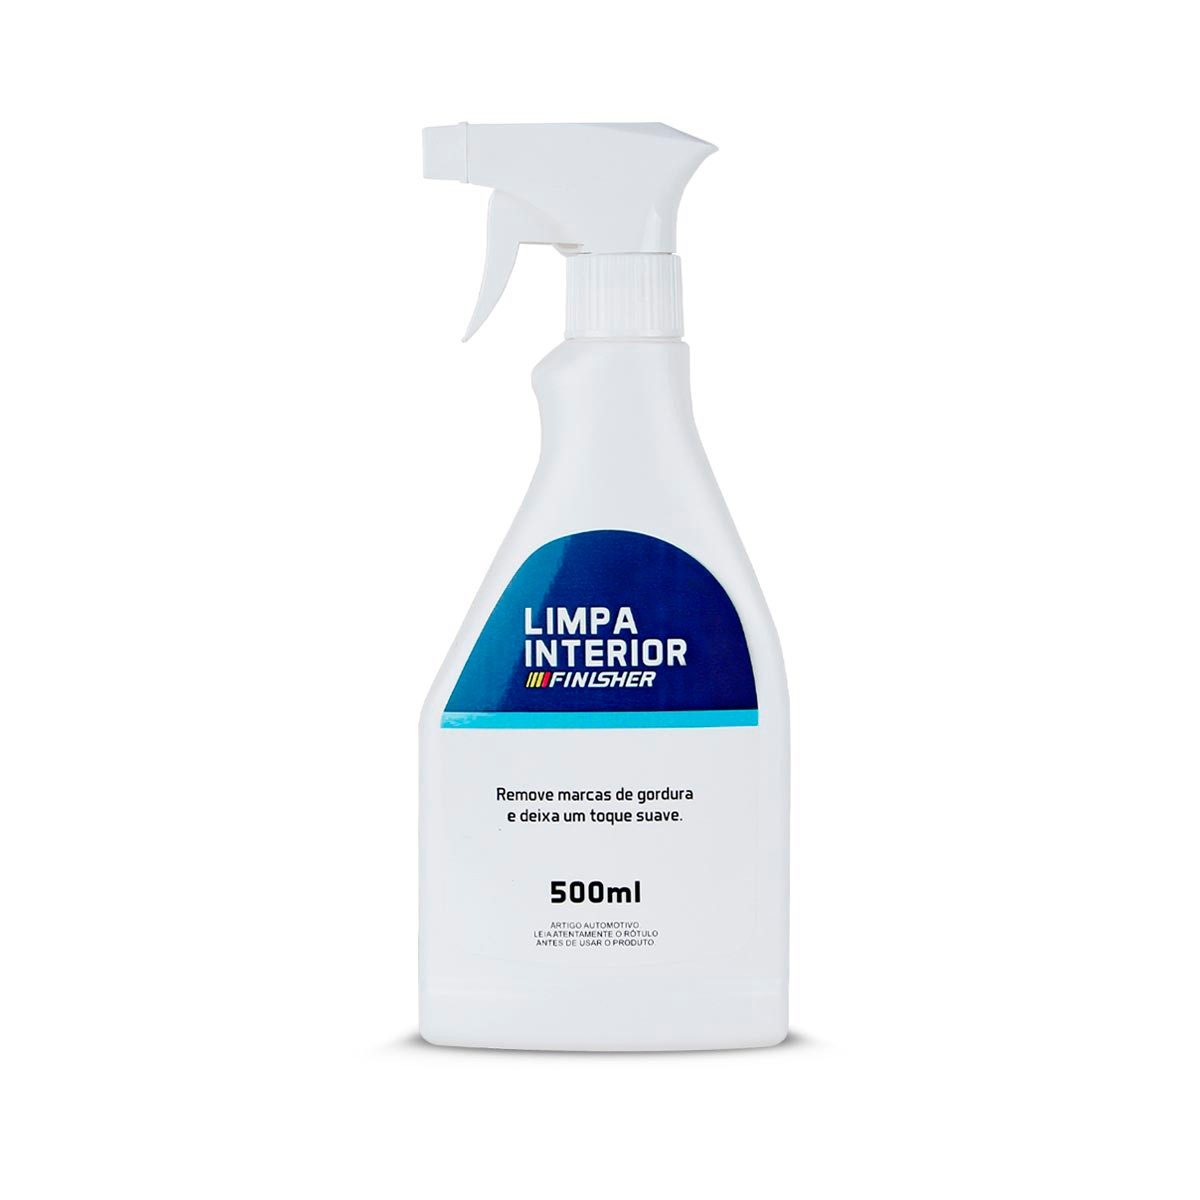 Limpa Interior Spray 500ml - Finisher